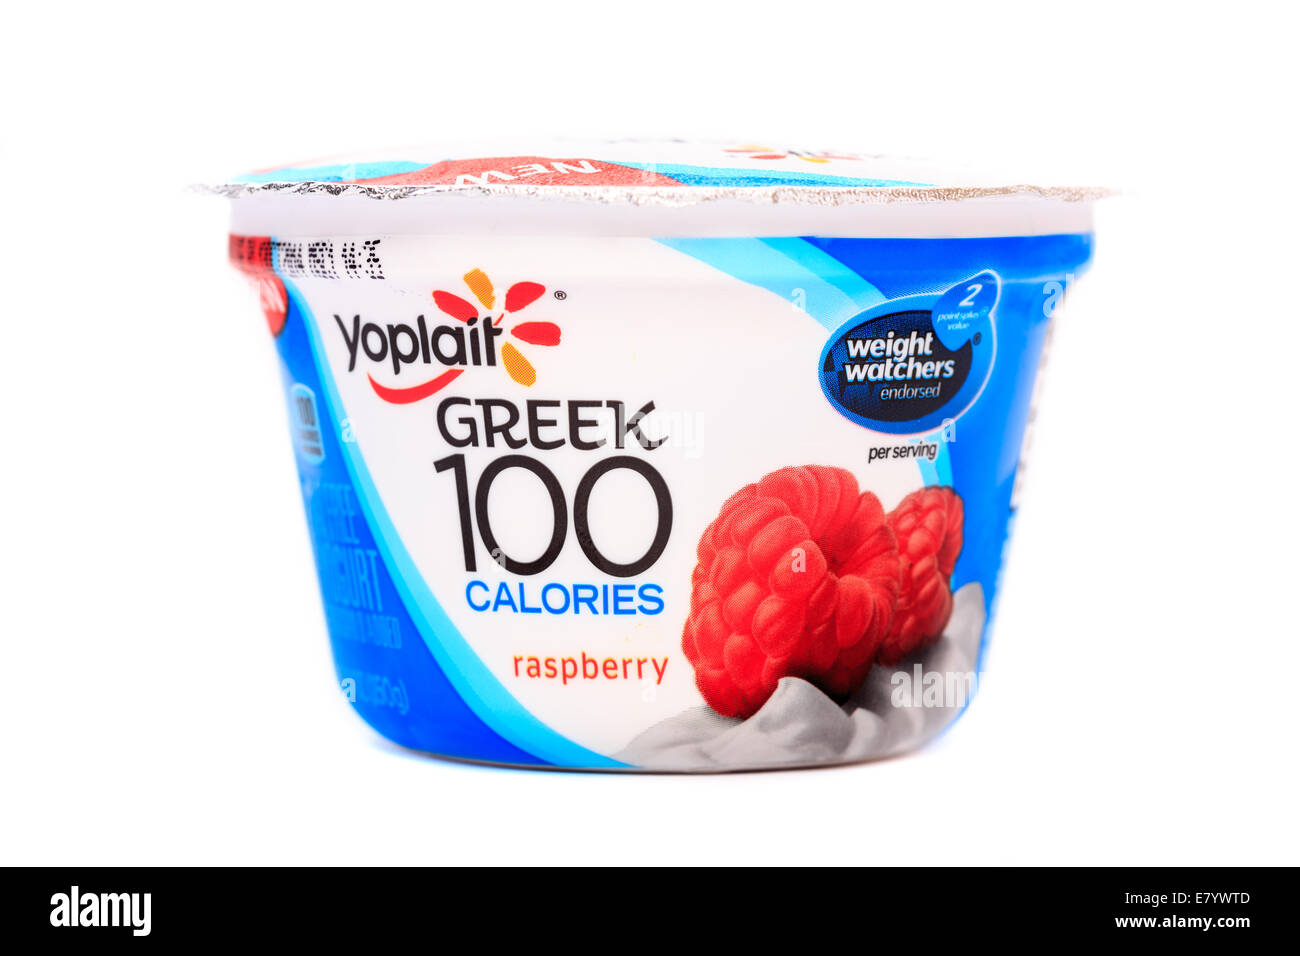 Yoplait Greek Raspberry Yogurt - Stock Image